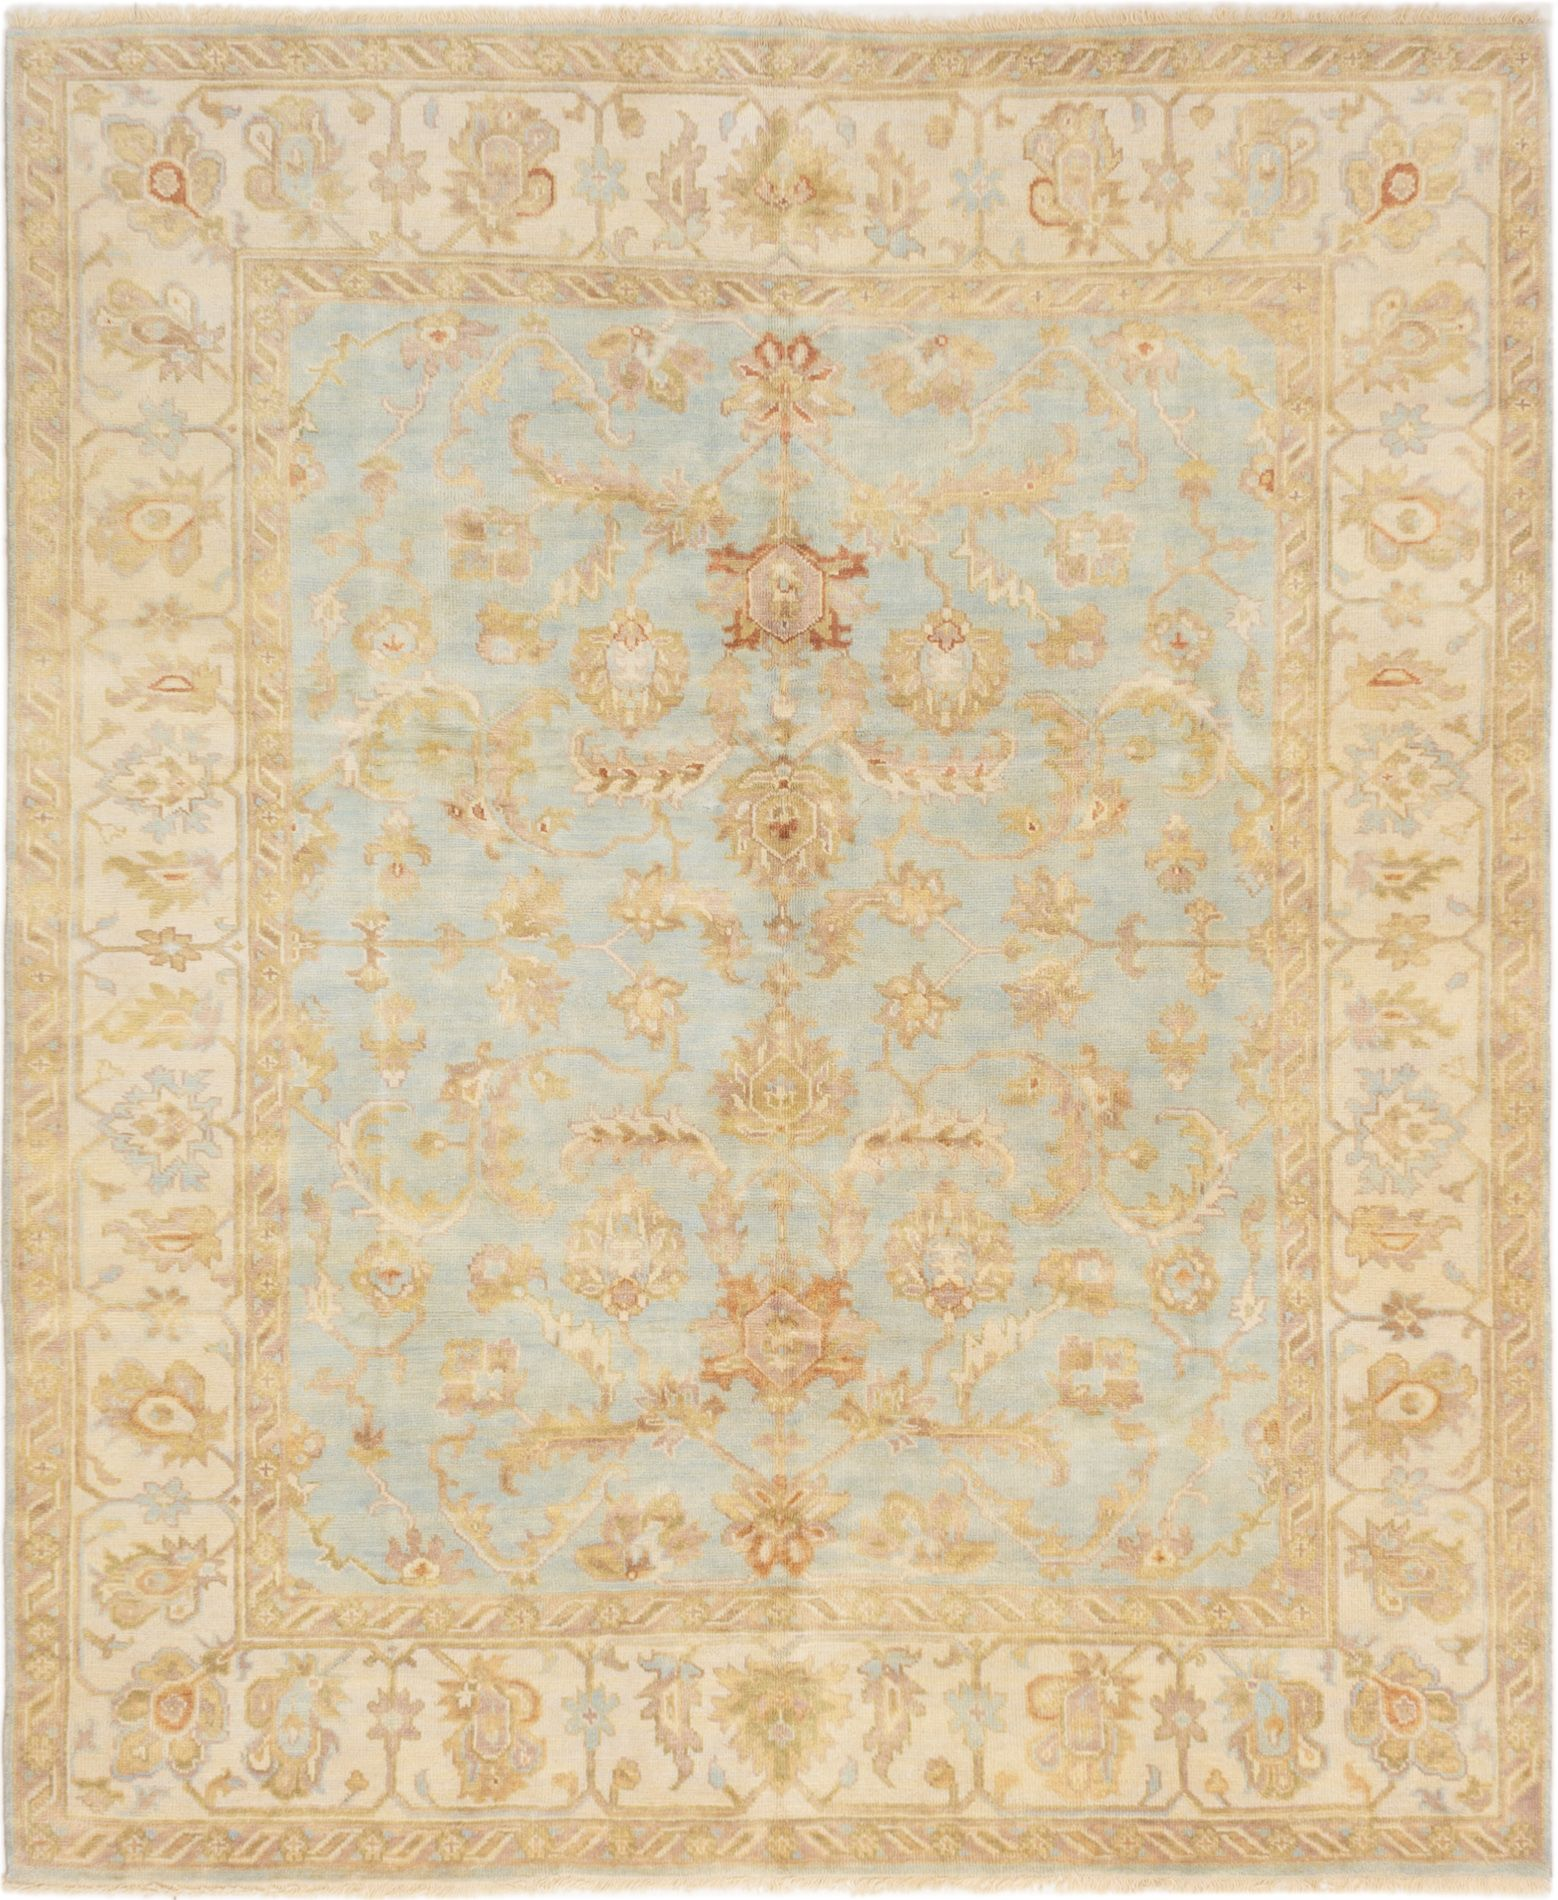 "Hand-knotted Finest Ushak Light Blue  Wool Rug 8'2"" x 9'10"" Size: 8'2"" x 9'10"""